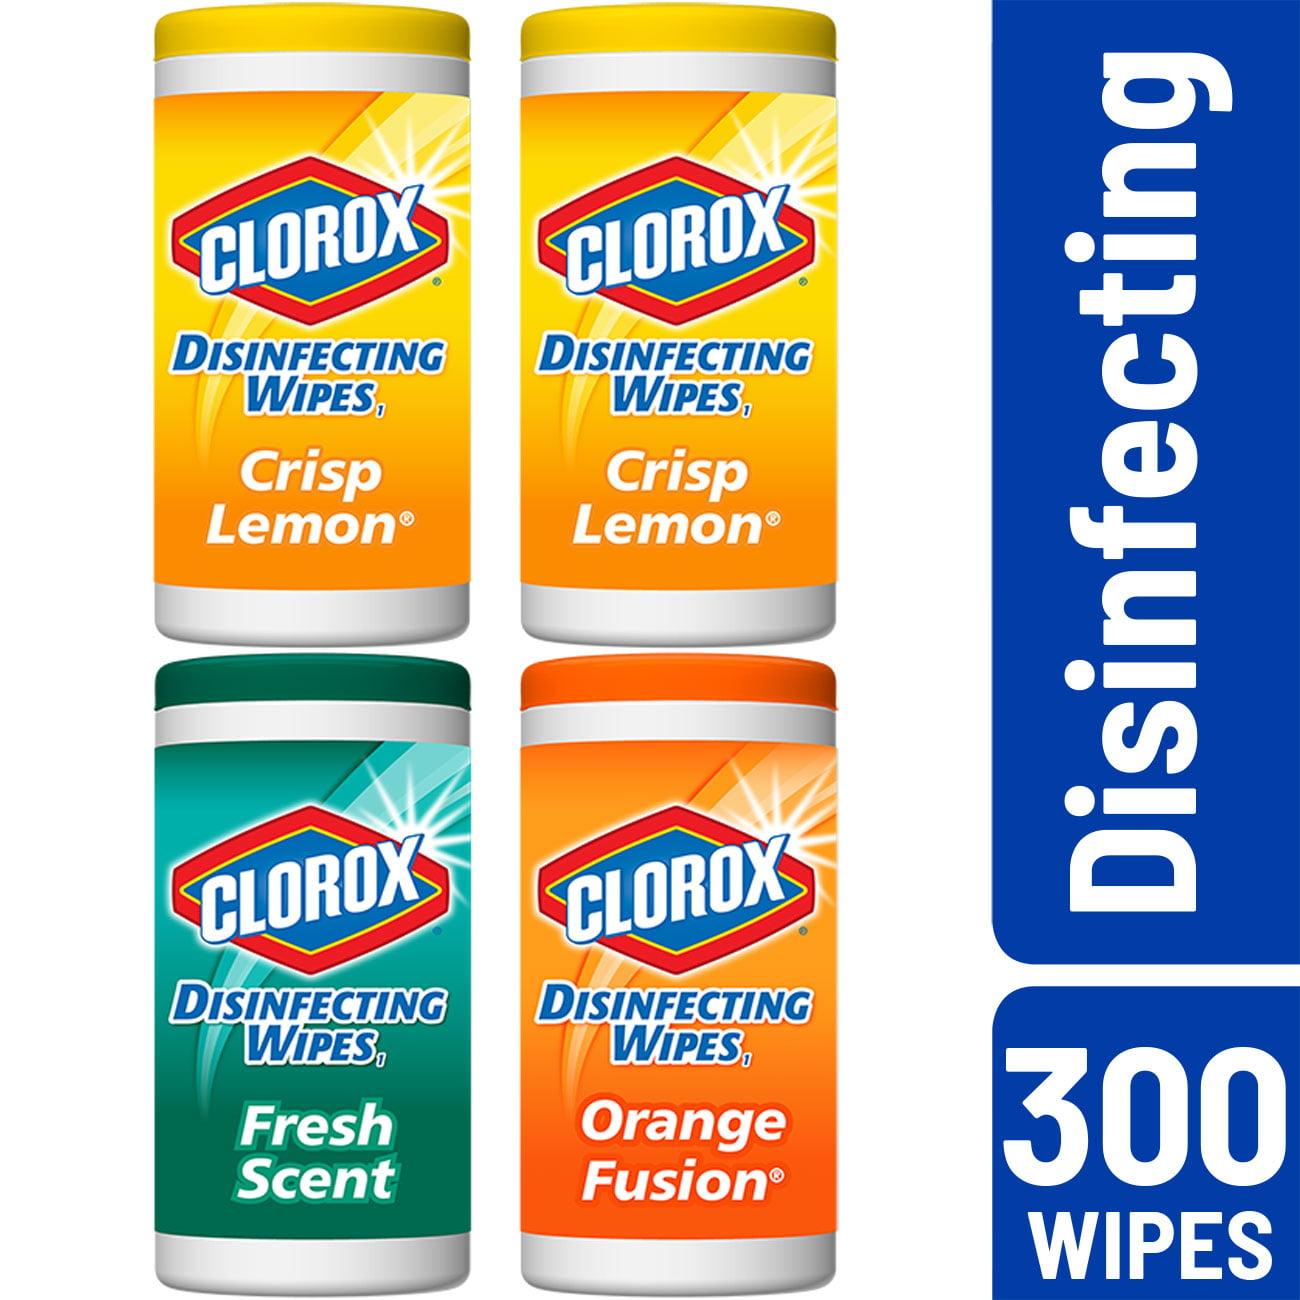 Clorox Disinfecting Wipes, Value Pack, Crisp Lemon, Fresh Scent and Orange Fusion, 75 Wipes, 4 ct